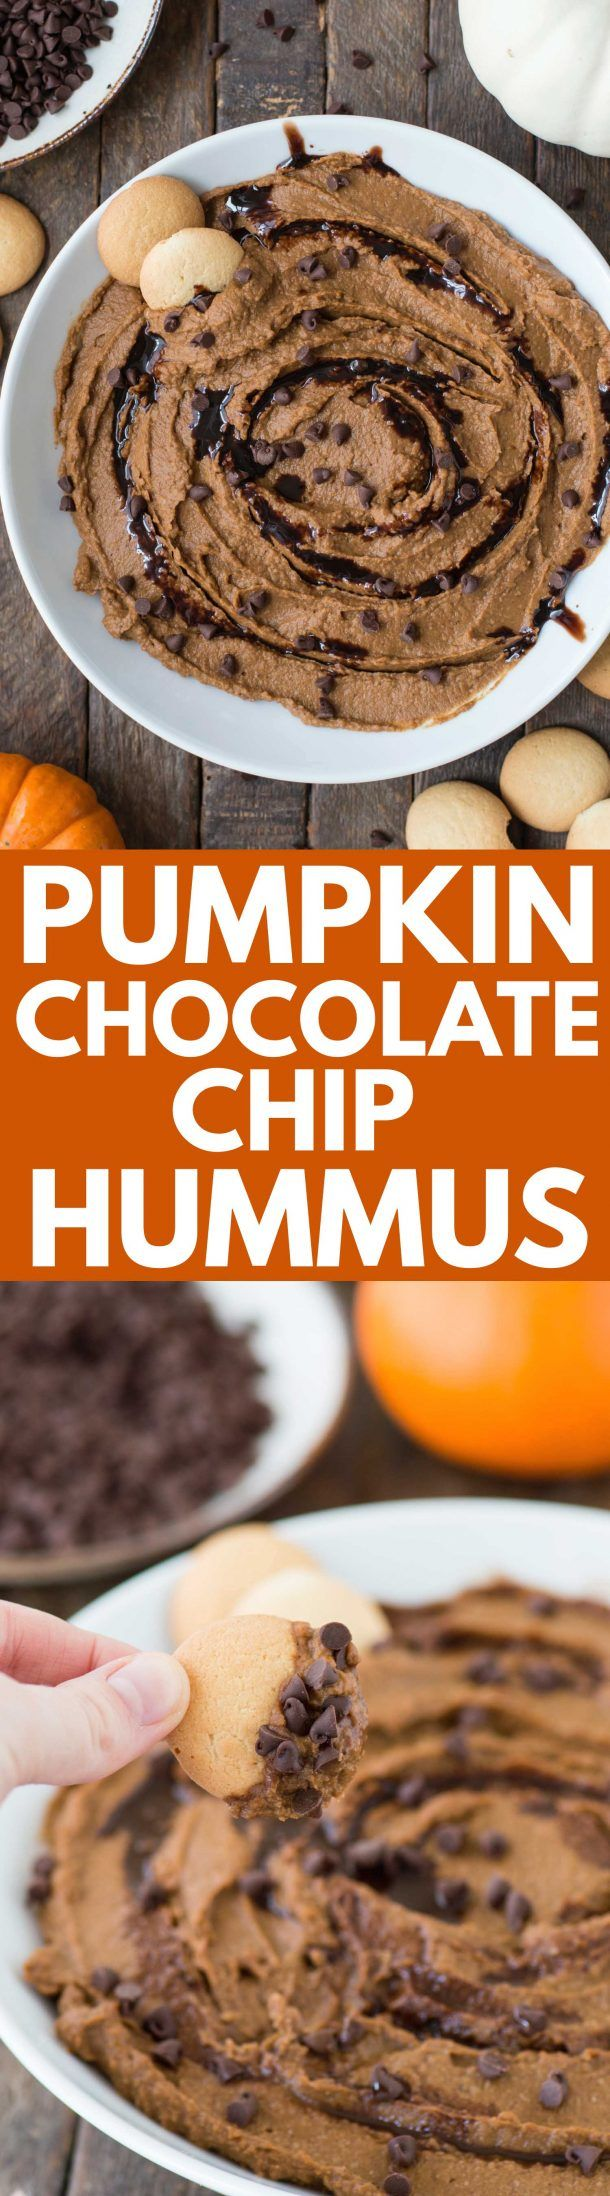 A healthier dessert hummus for the fall! Pumpkin chocolate chip hummus! #desserthummus